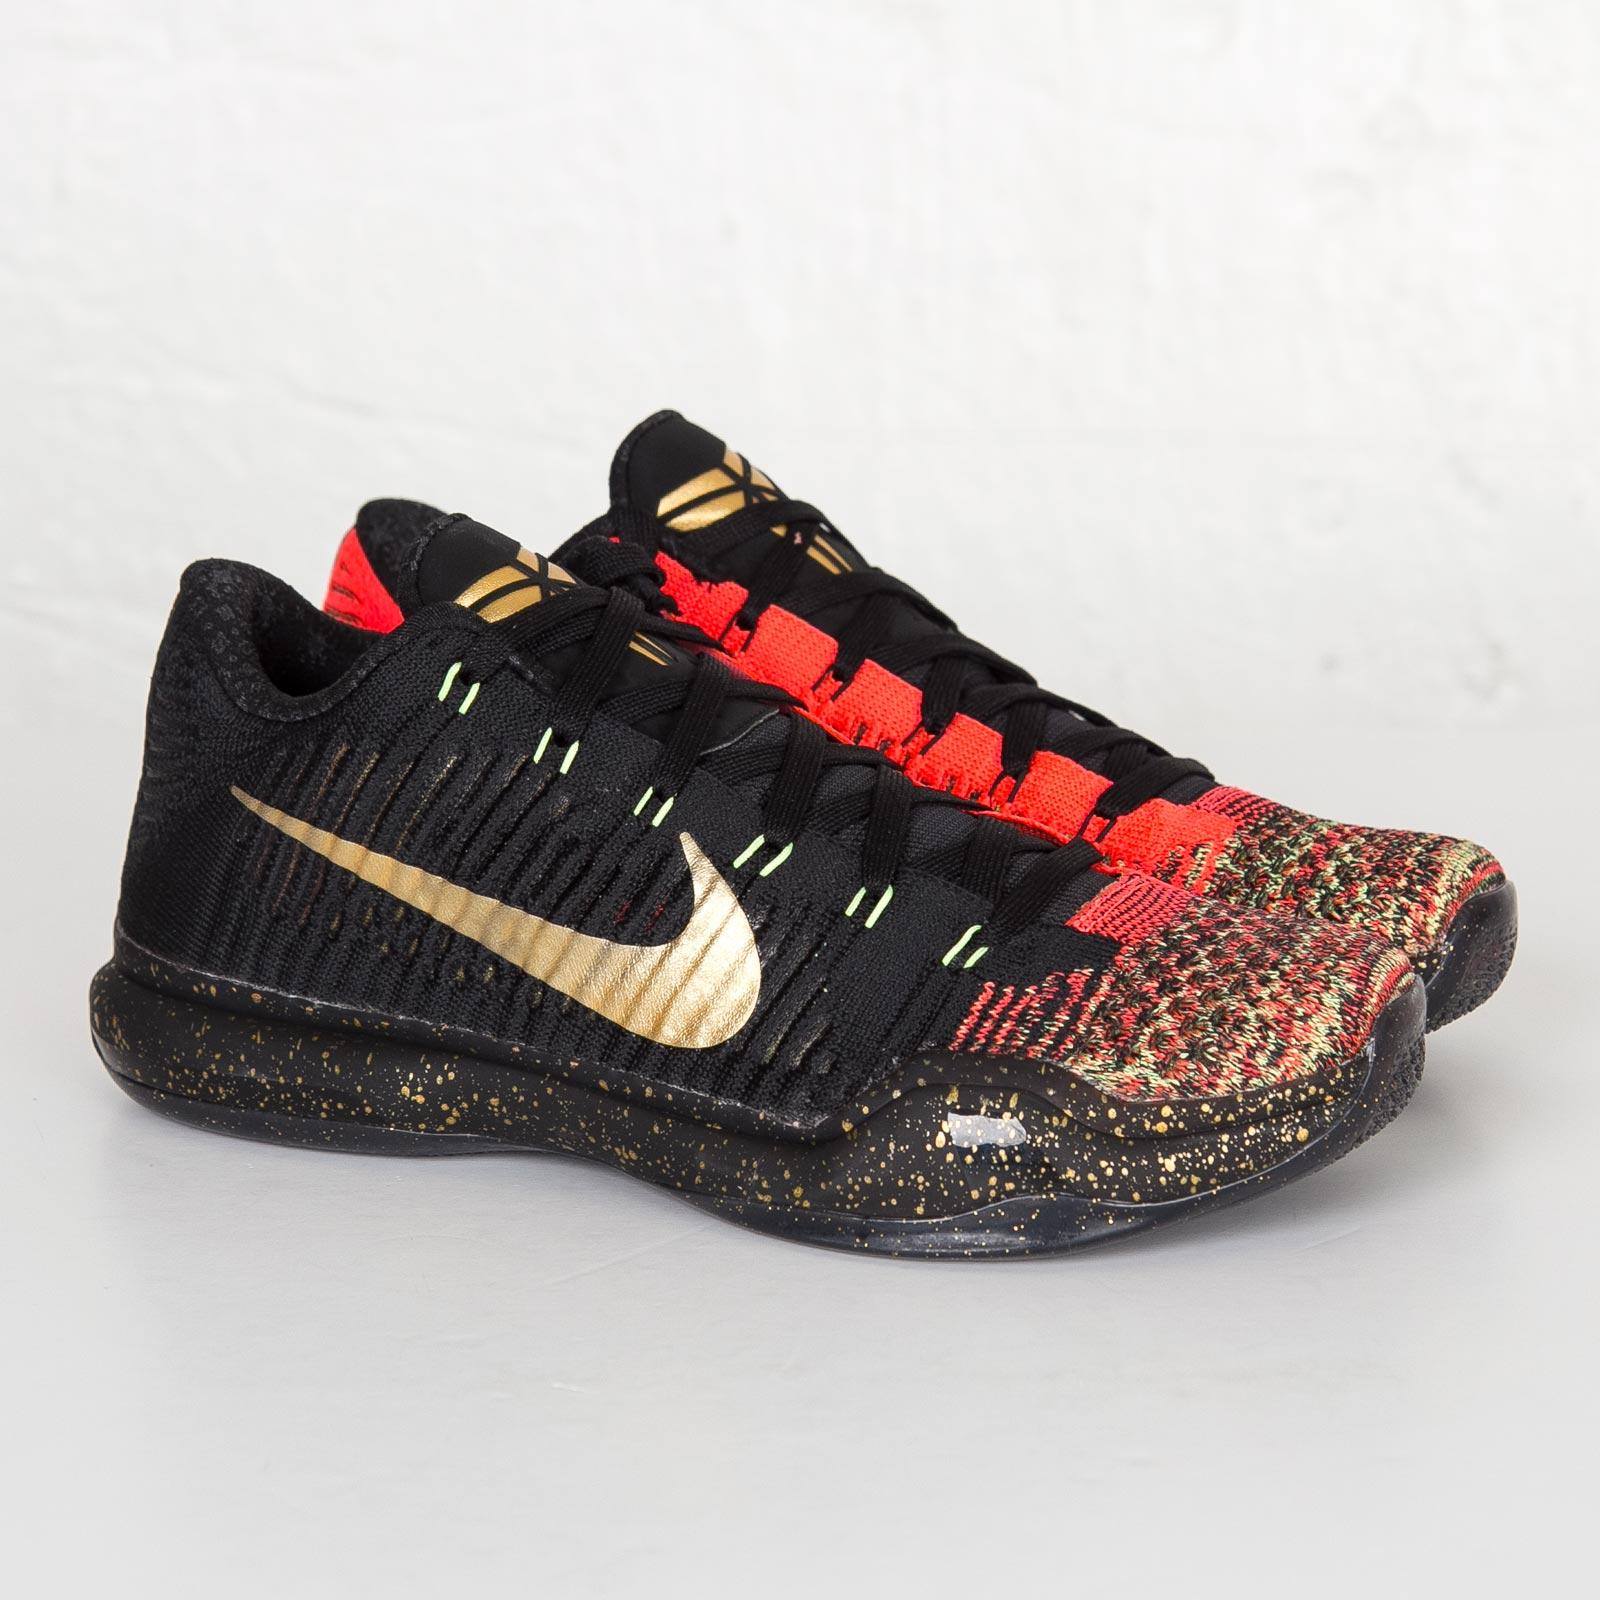 competitive price b7dd5 e764f Nike Kobe X Elite Low Xmas